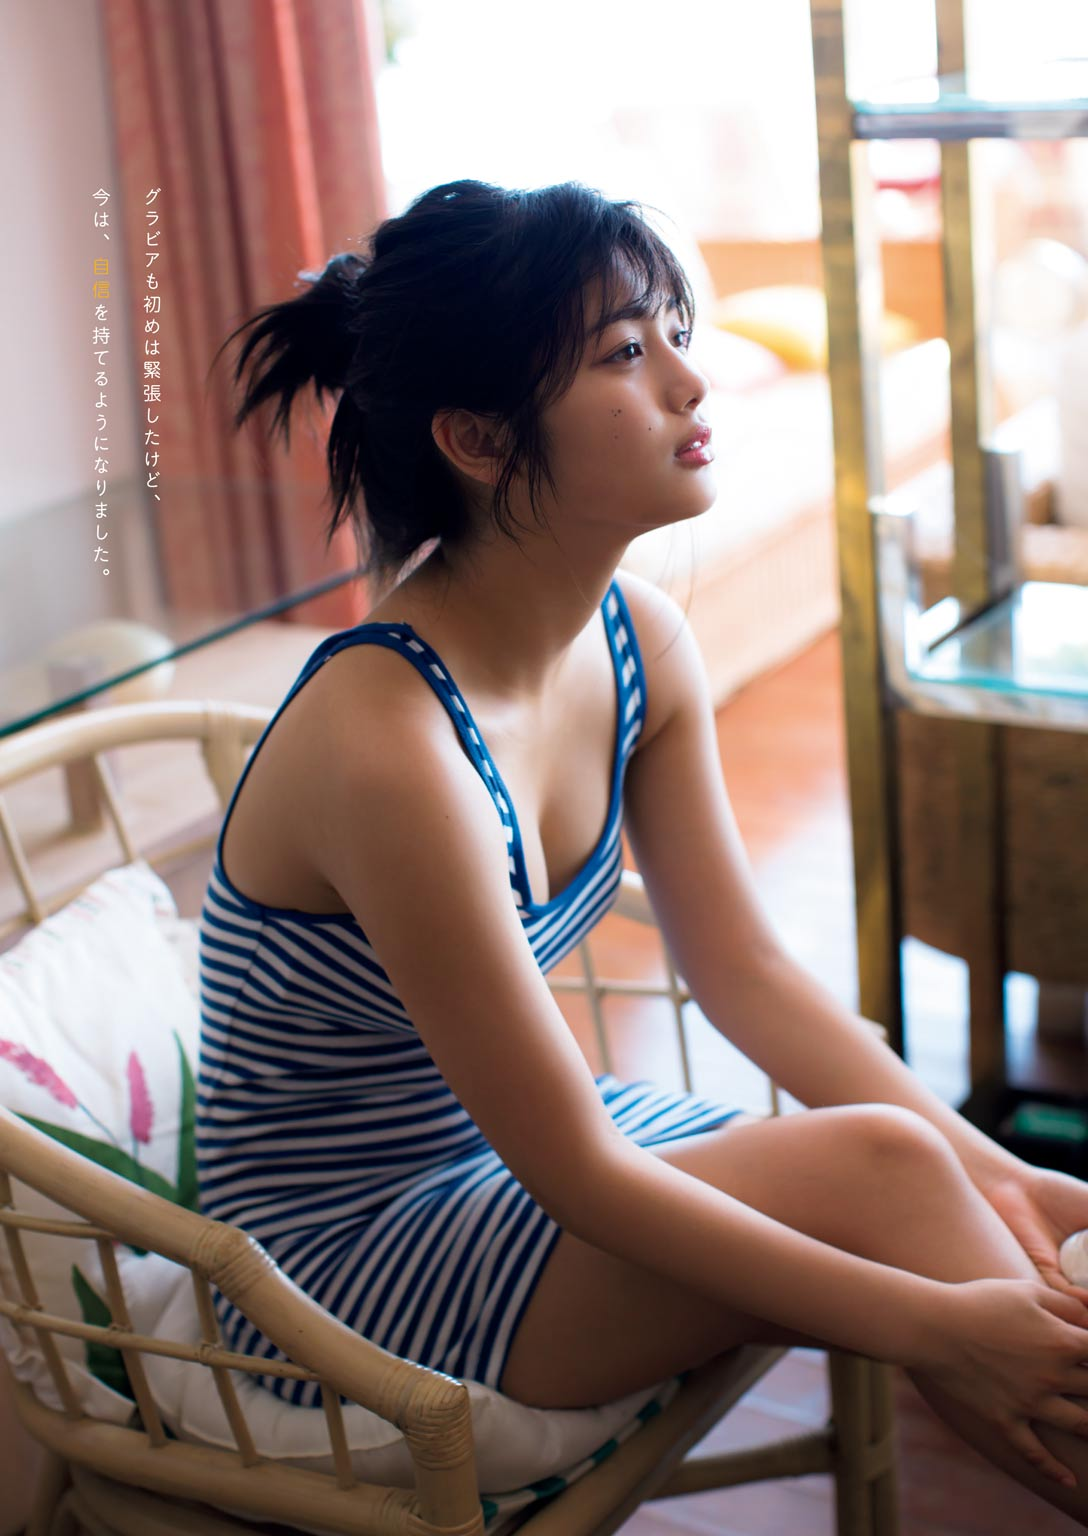 Kitano Ruka 北野瑠華, Weekly Playboy 2017.07.31 No.31 (週刊プレイボーイ 2017年31号)